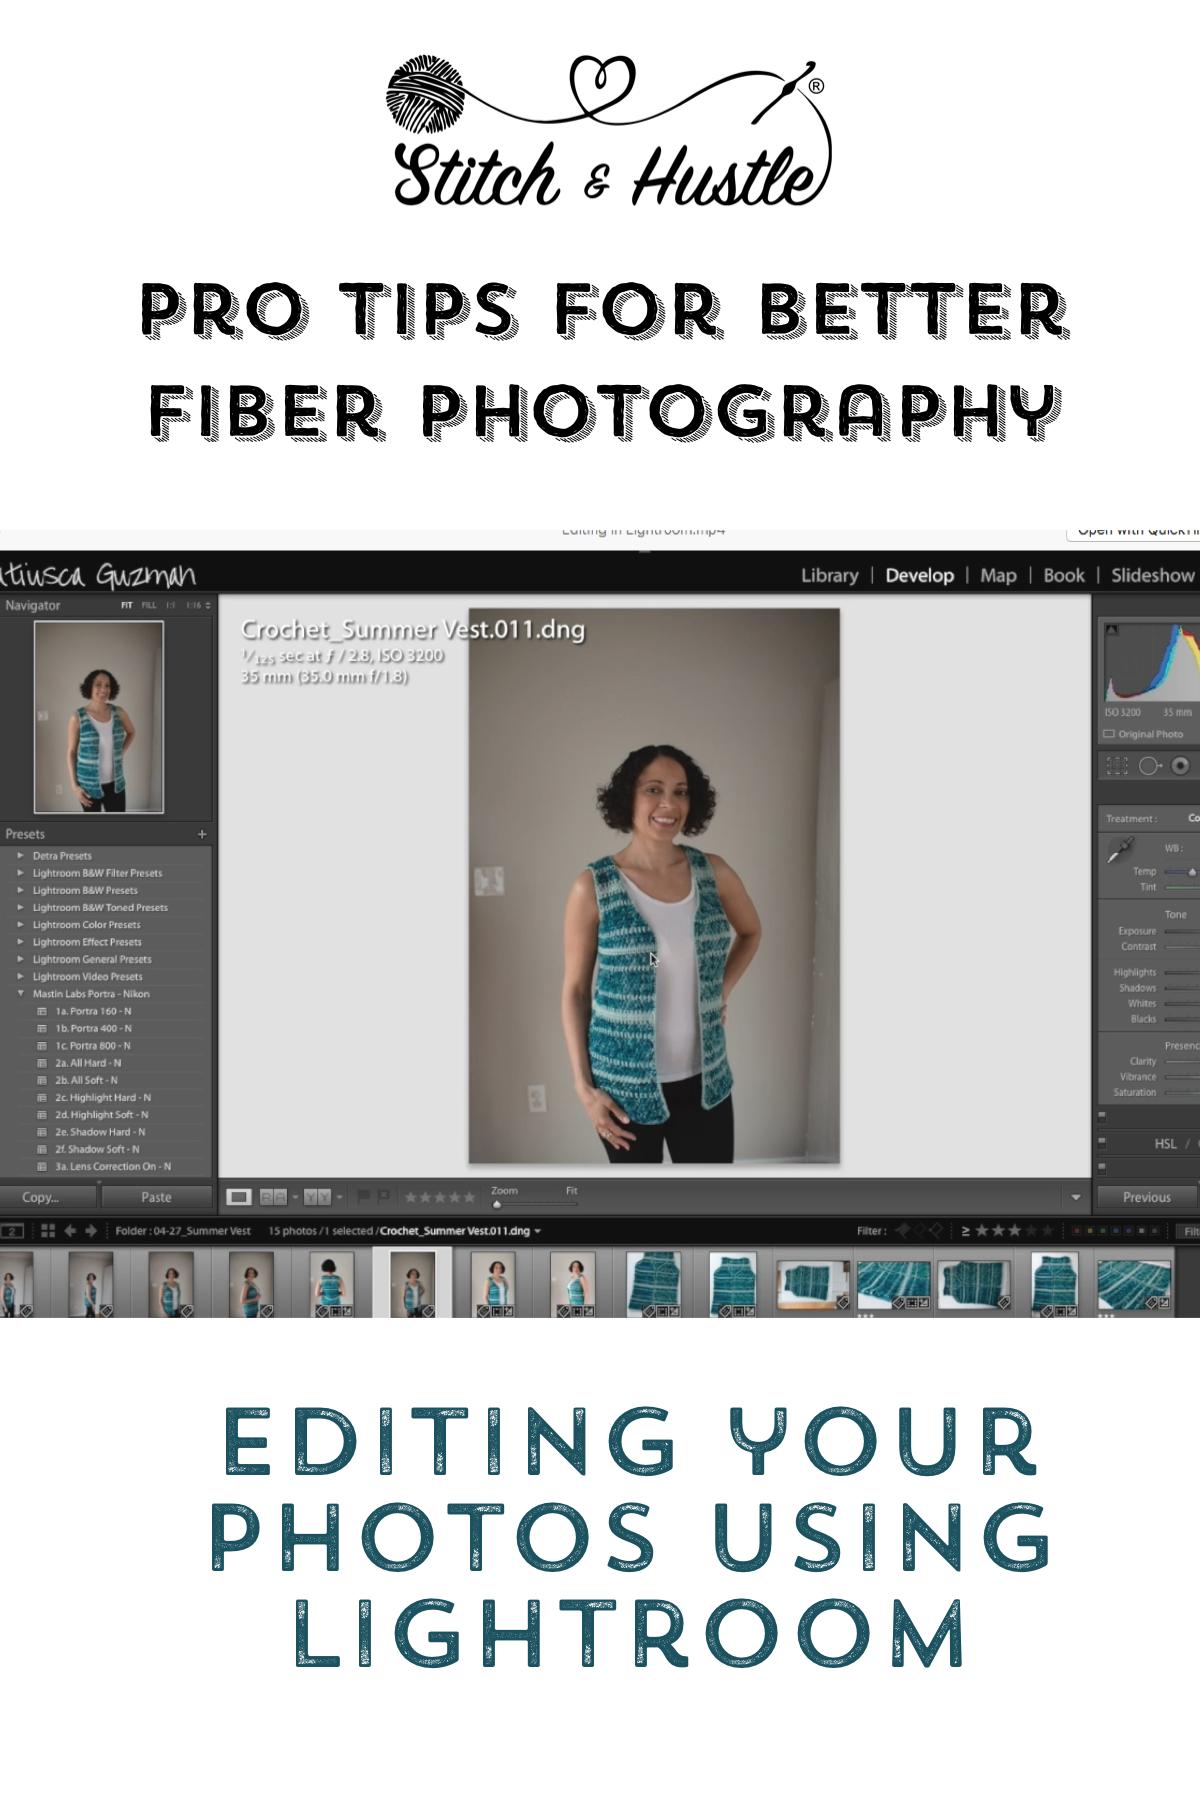 editing-photos-in-lightroom-2.jpeg